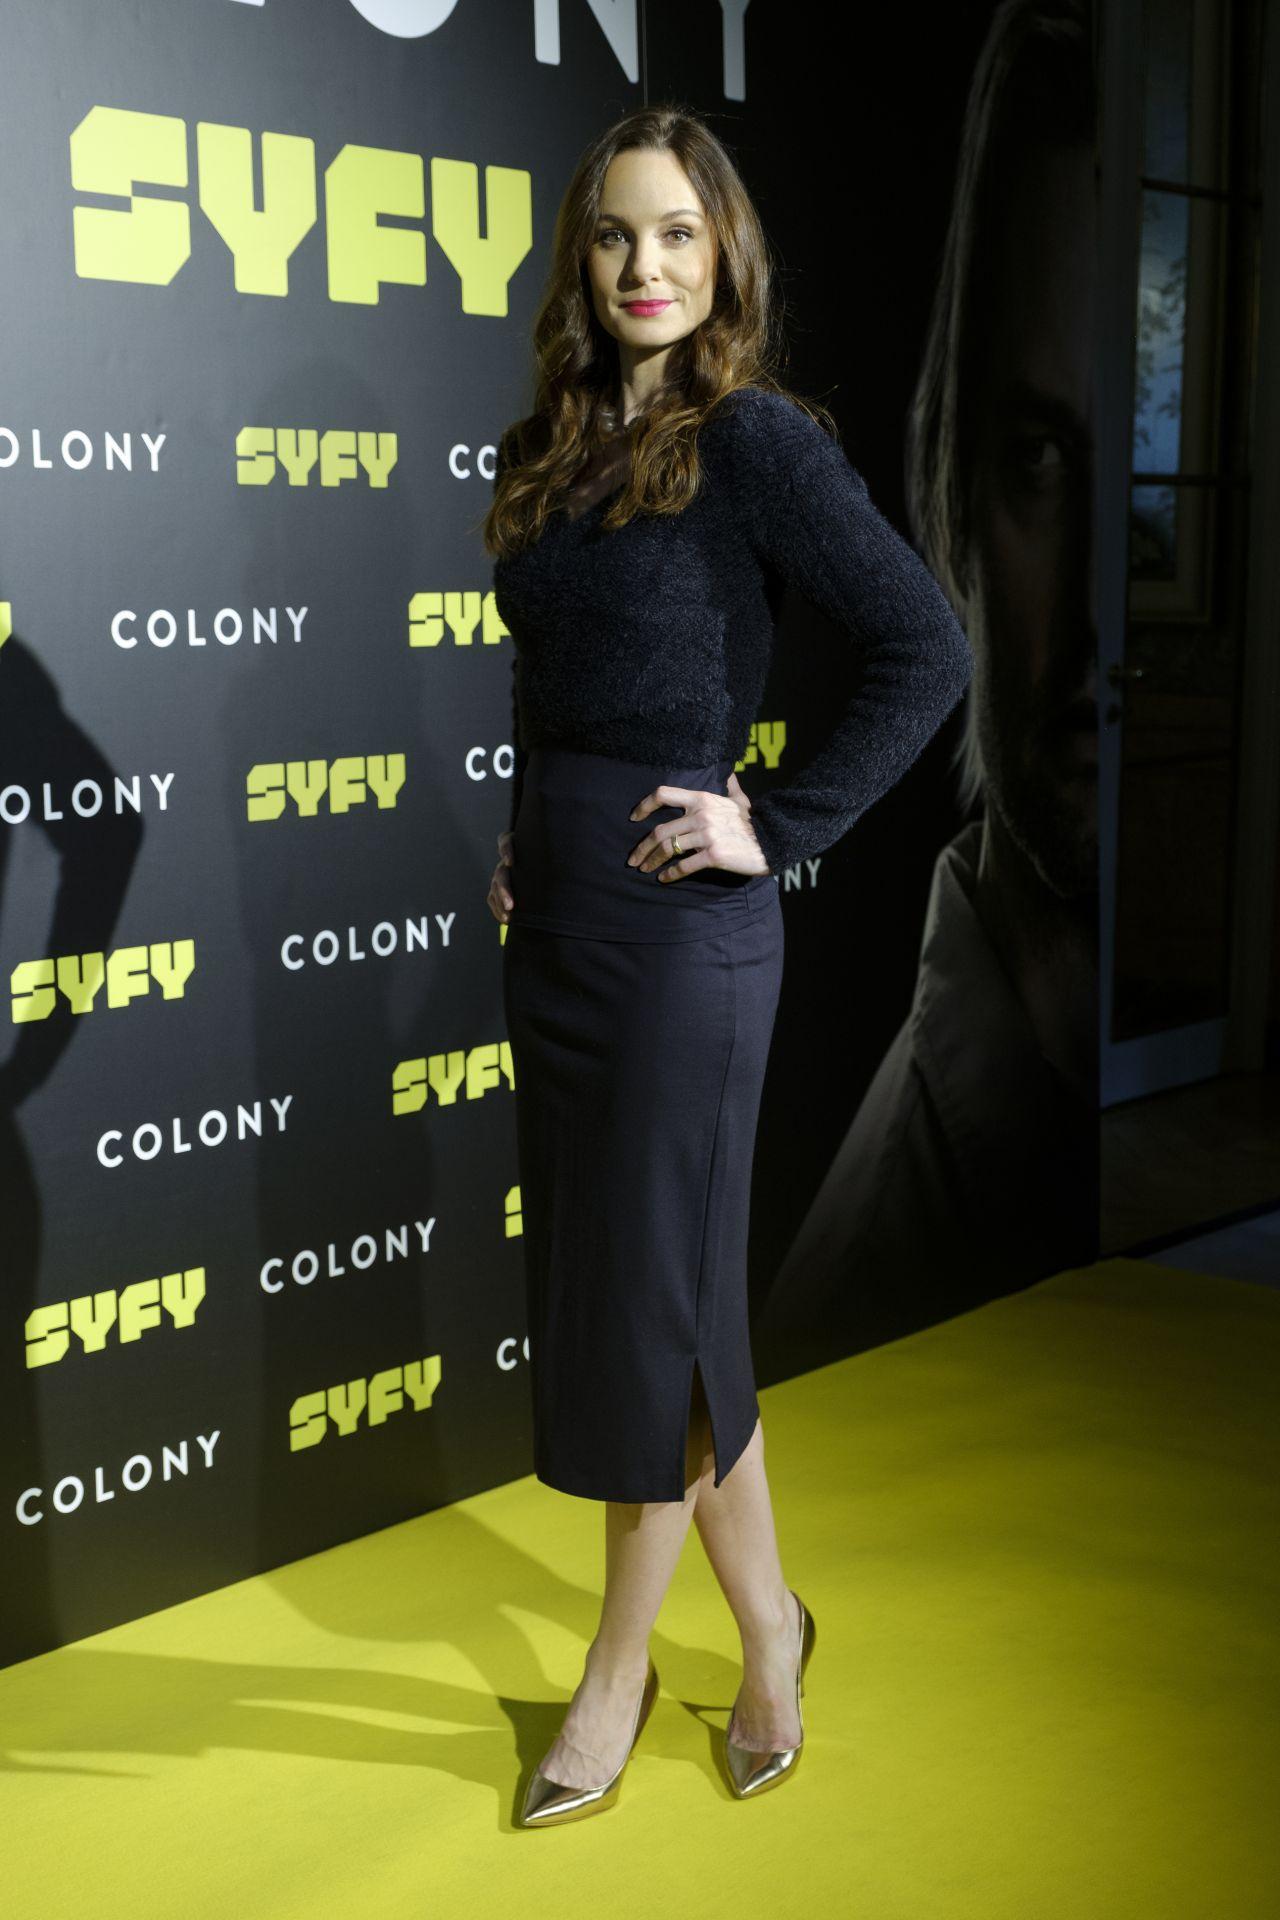 http://celebmafia.com/wp-content/uploads/2018/03/sarah-wayne-callies-colony-photocall-in-madrid-10.jpg